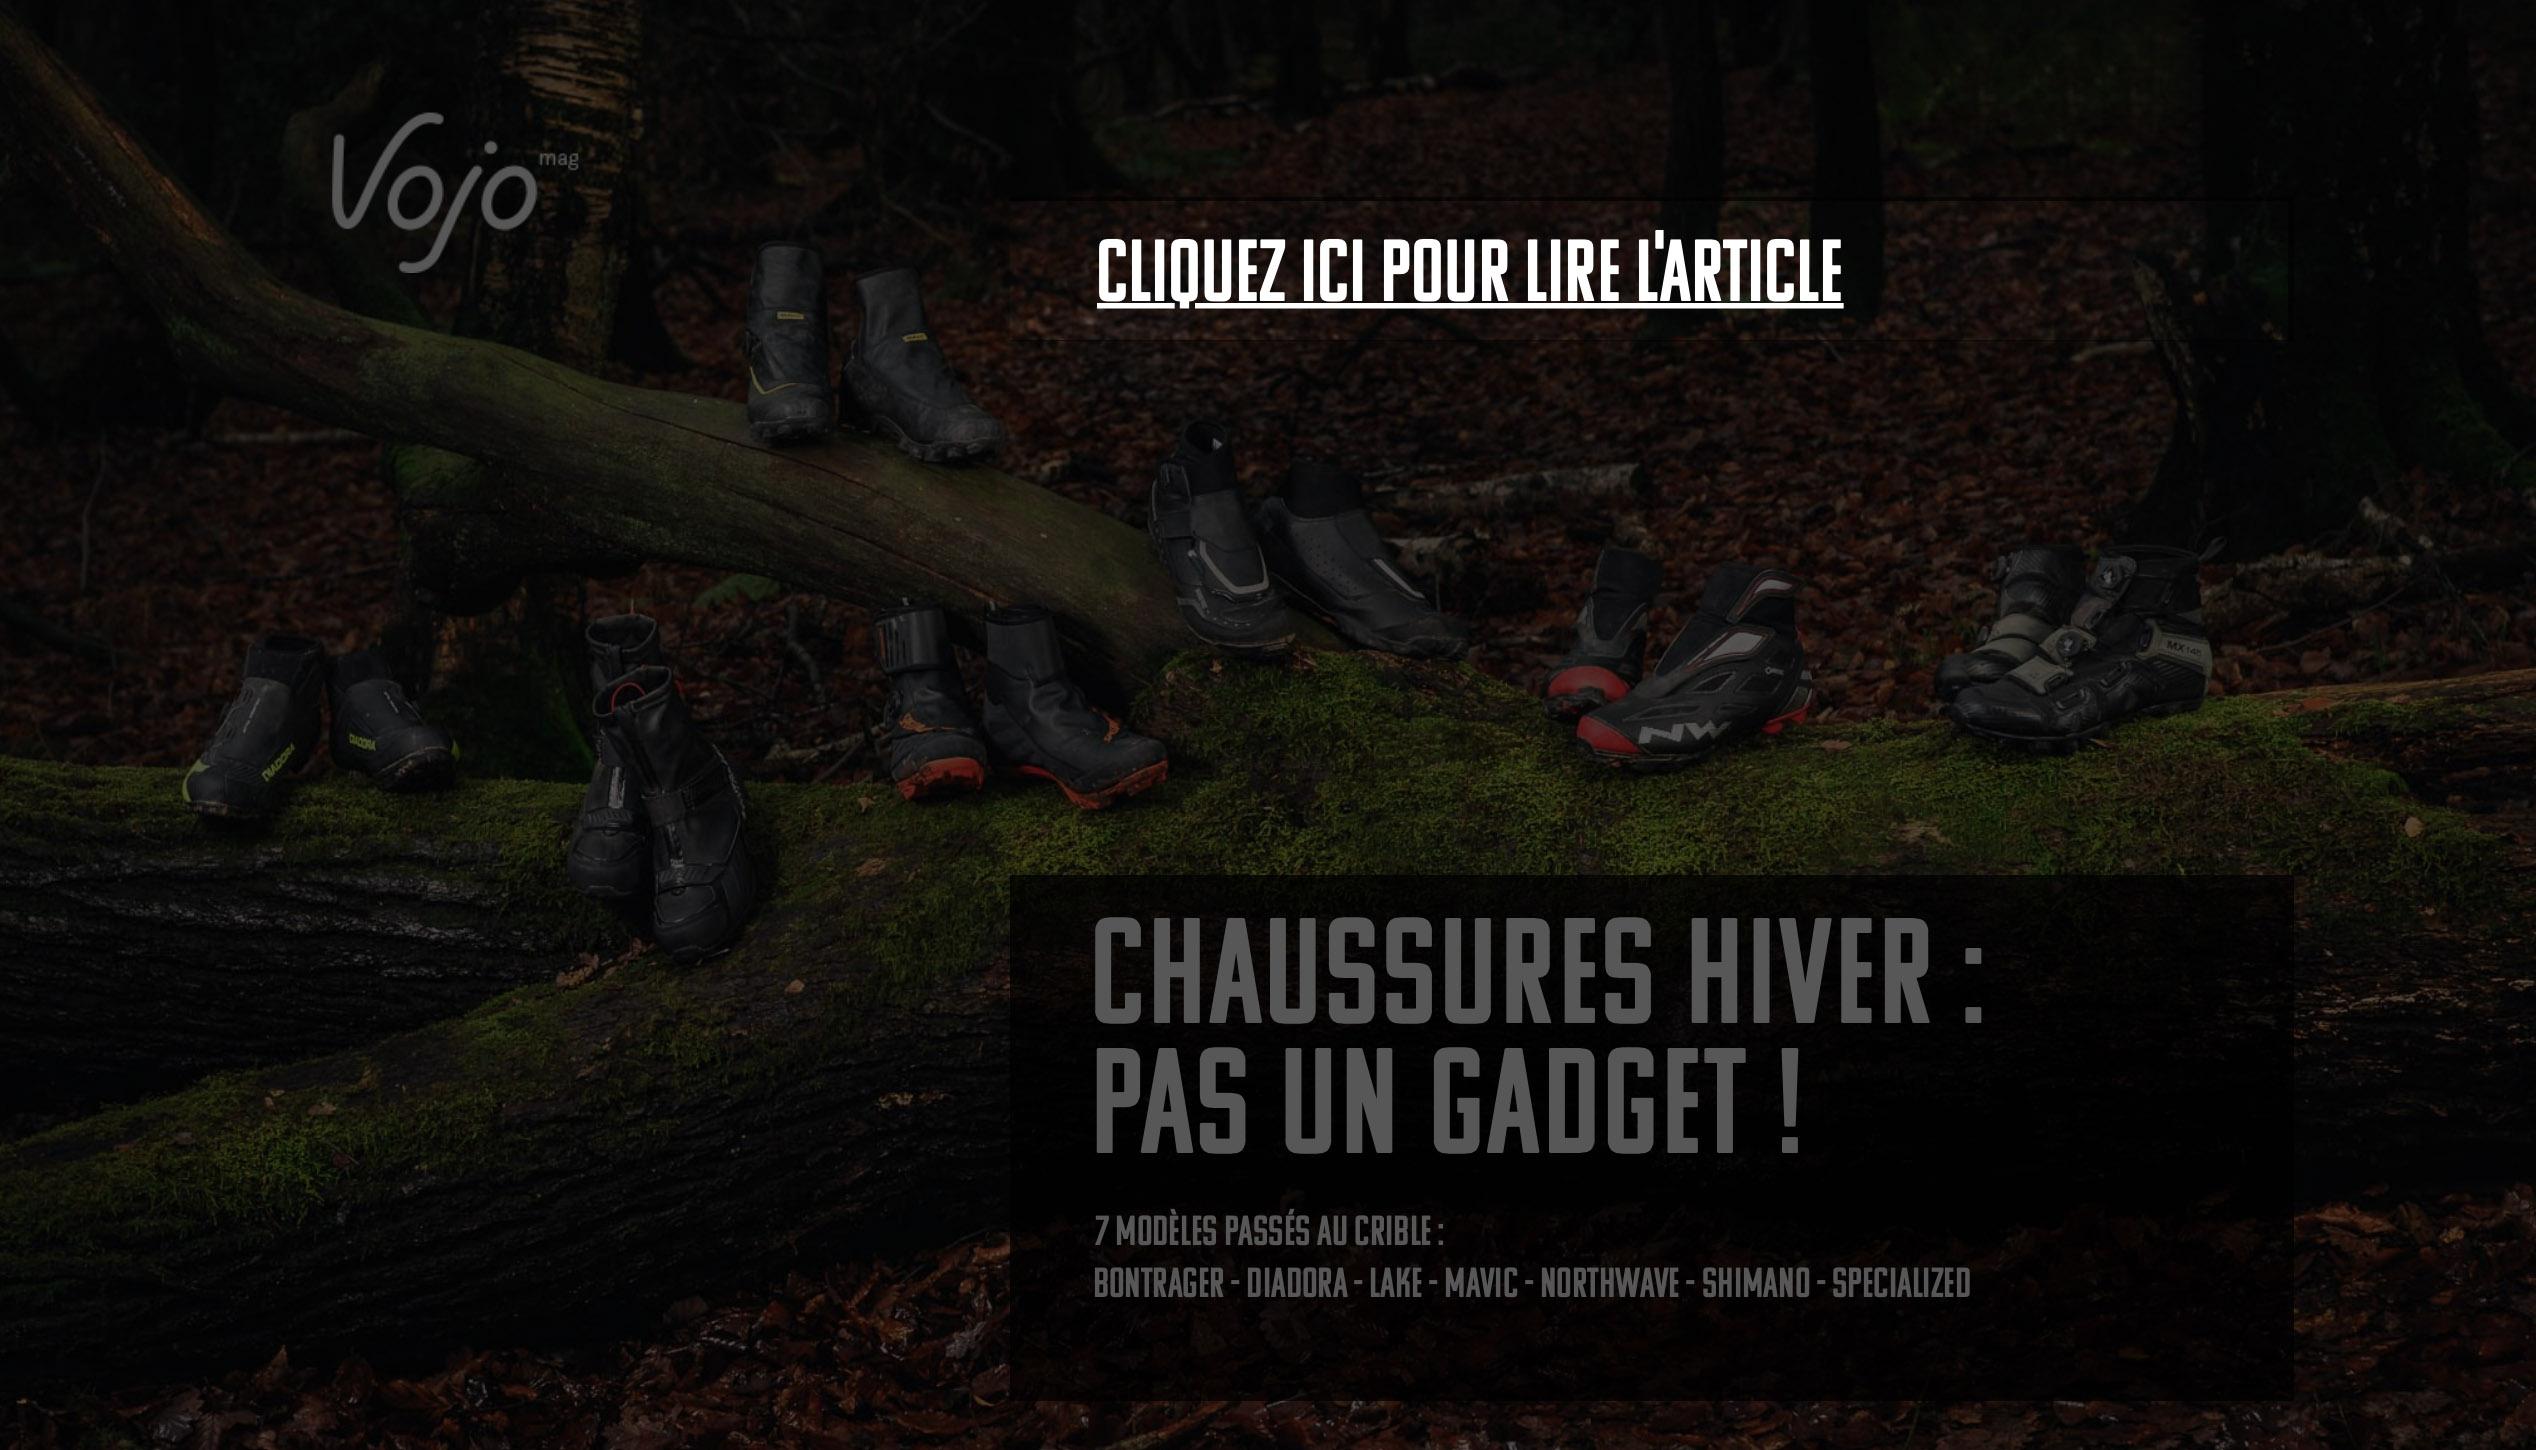 Dossier_chaussures_hiver_vojo